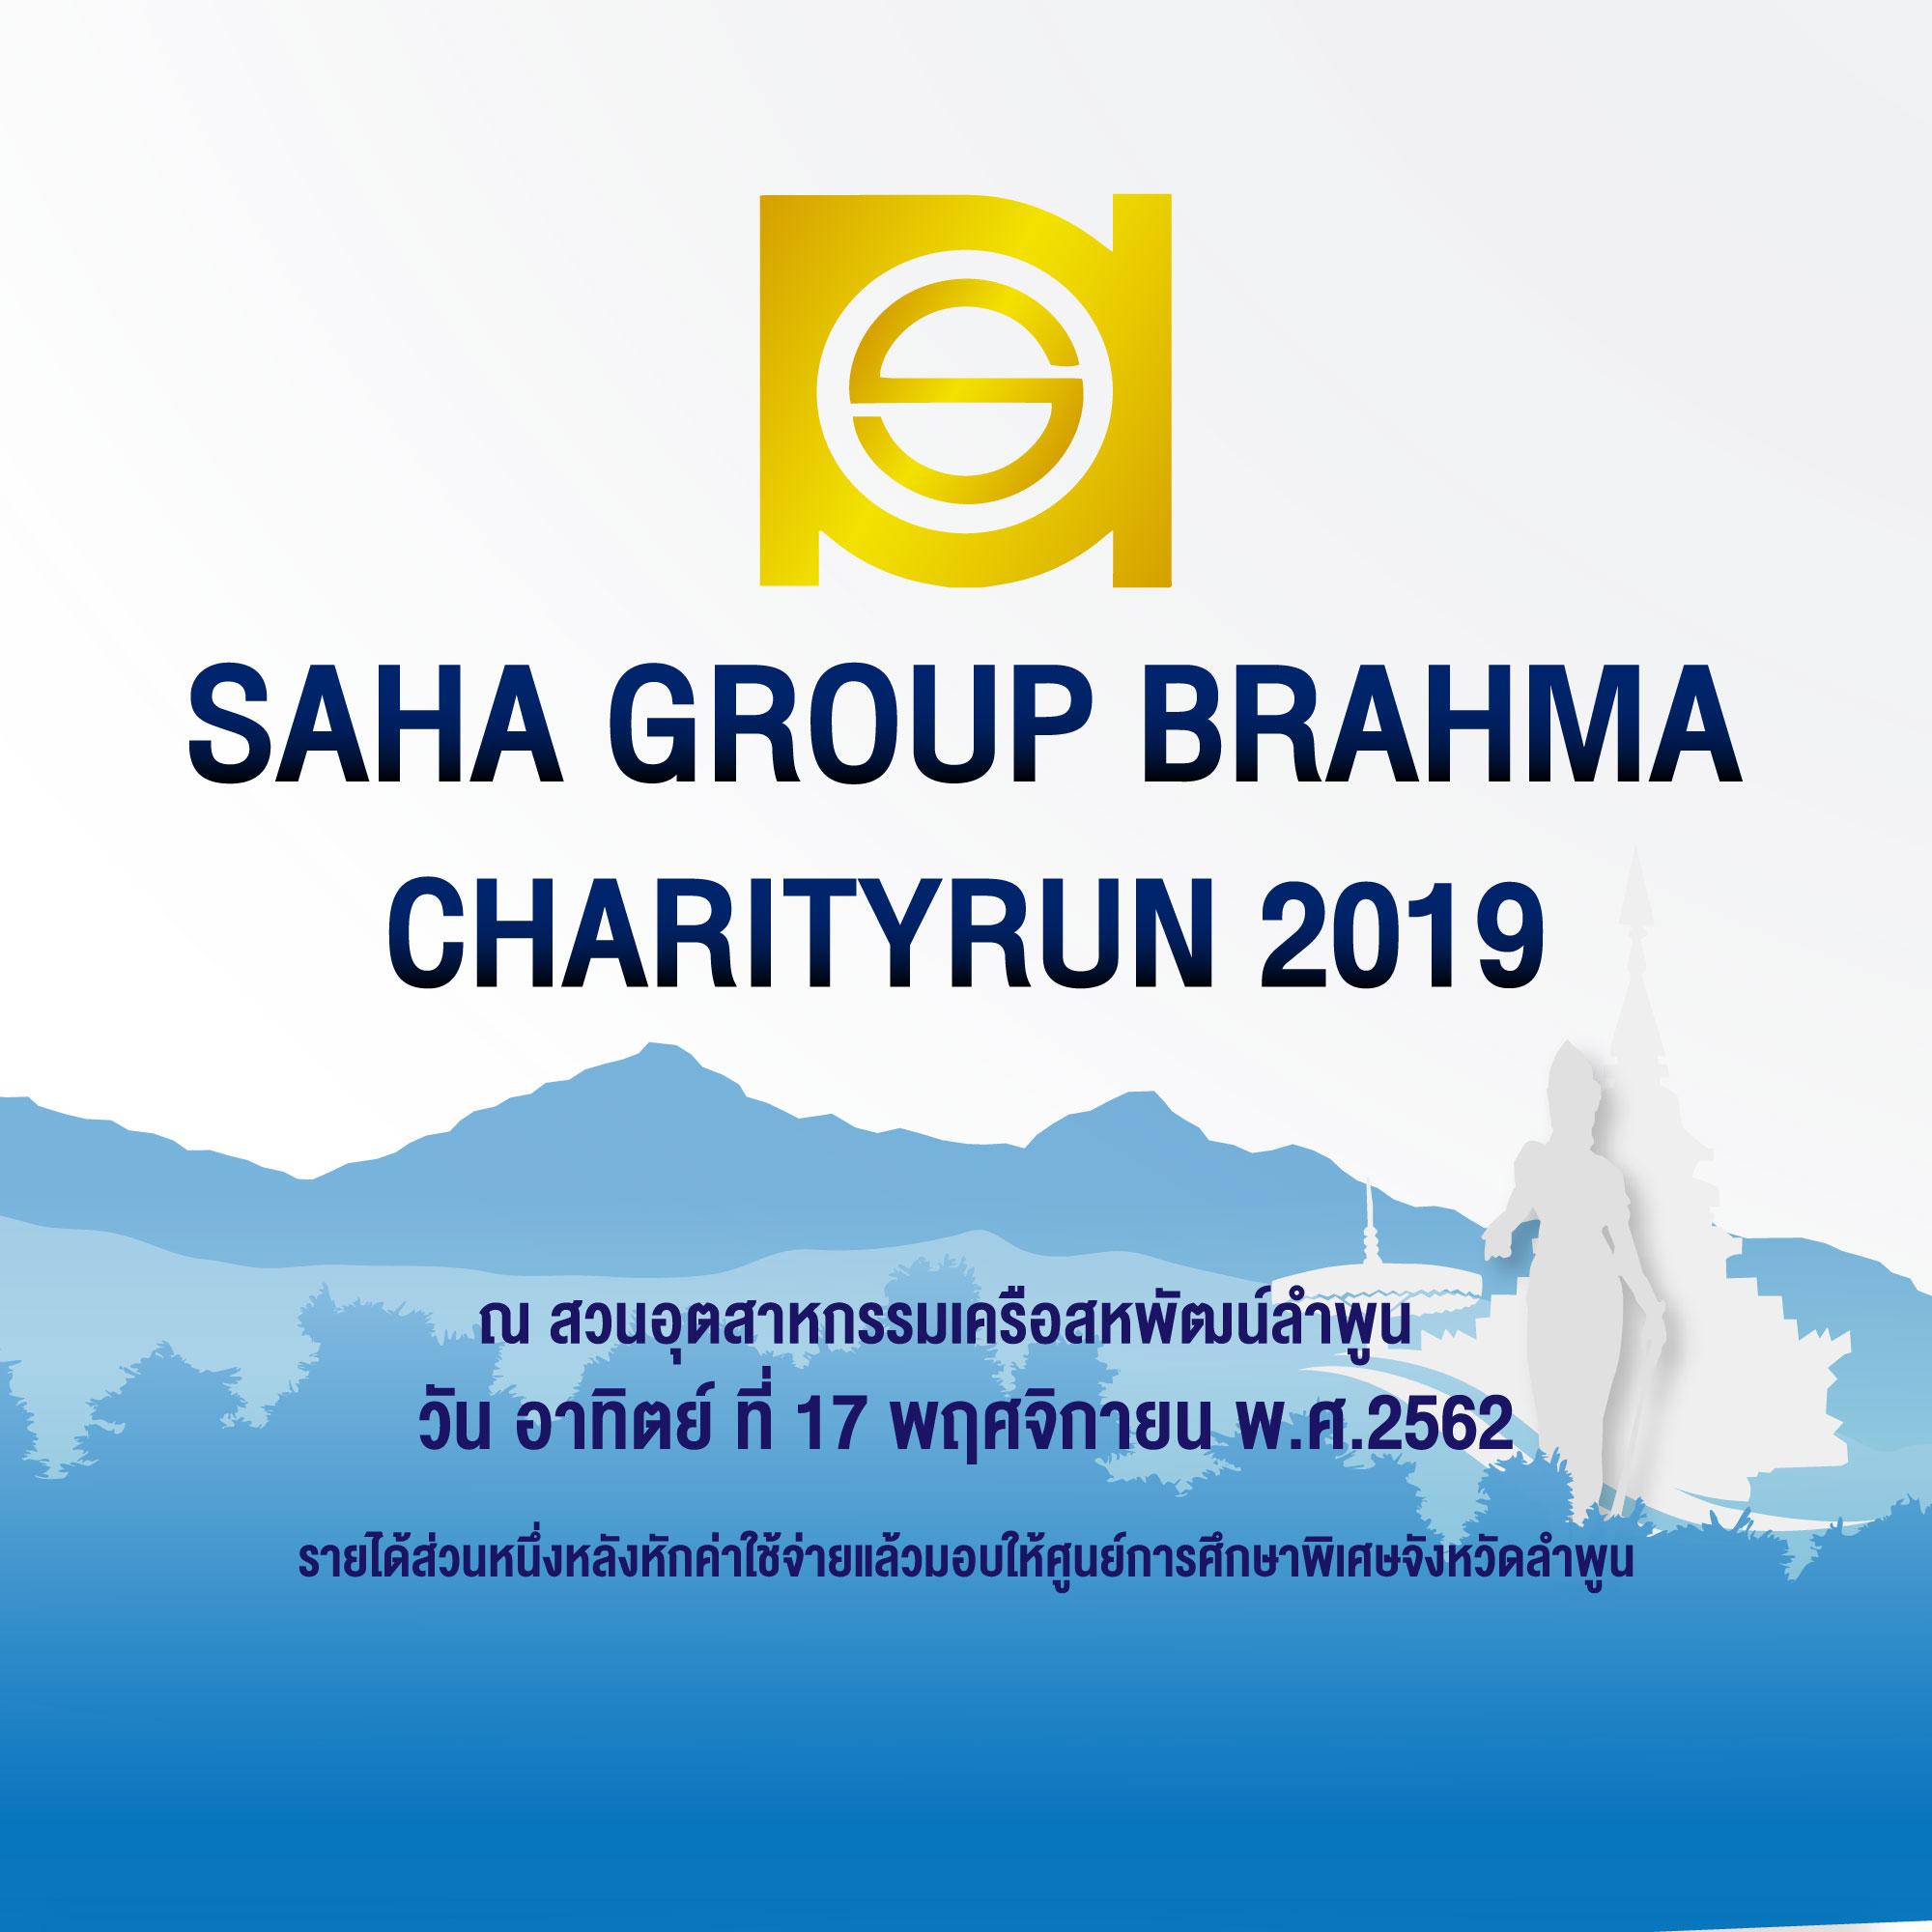 SAHA GROUP PRAPROM CHARITYRUN 2019